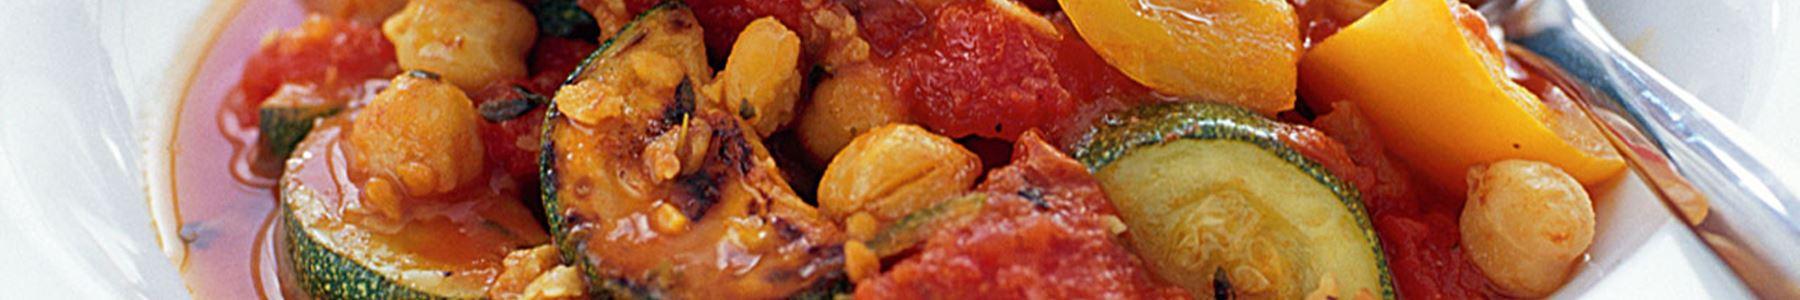 Kalorisnål + Lunch + Gremolata